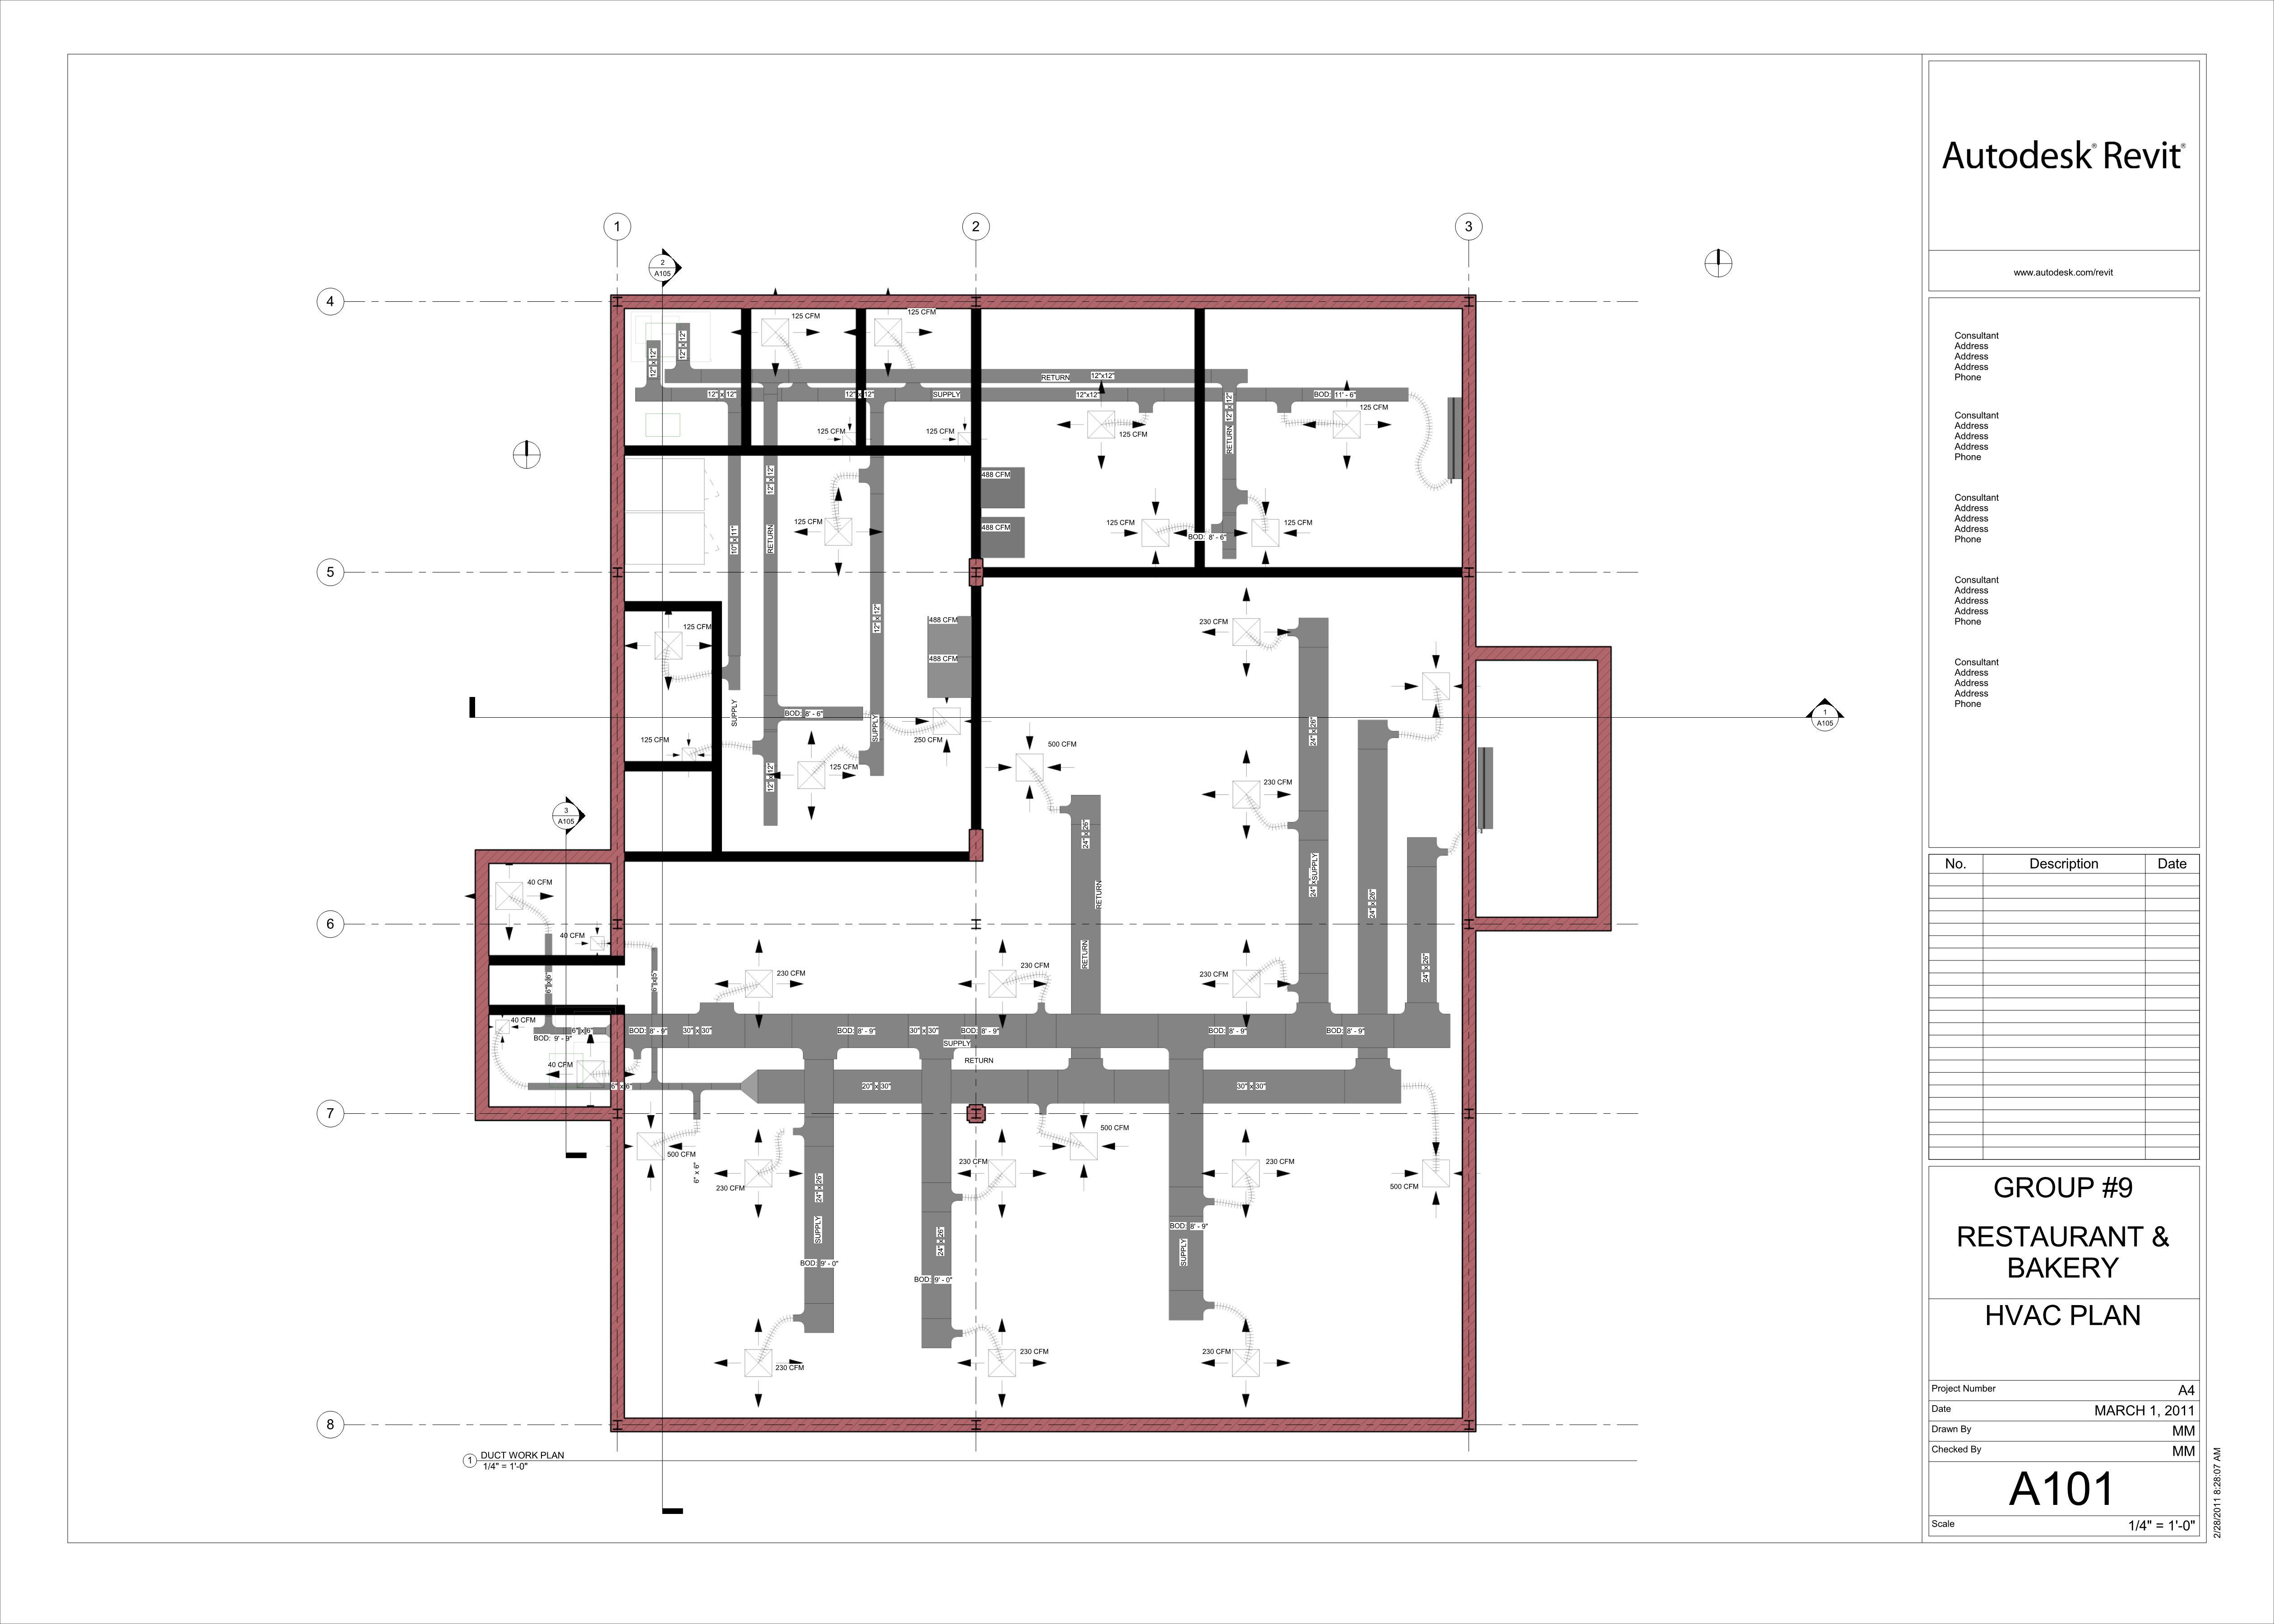 reading wiring diagrams hvac 99 jeep cherokee stereo diagram residential sprinkler system - imageresizertool.com